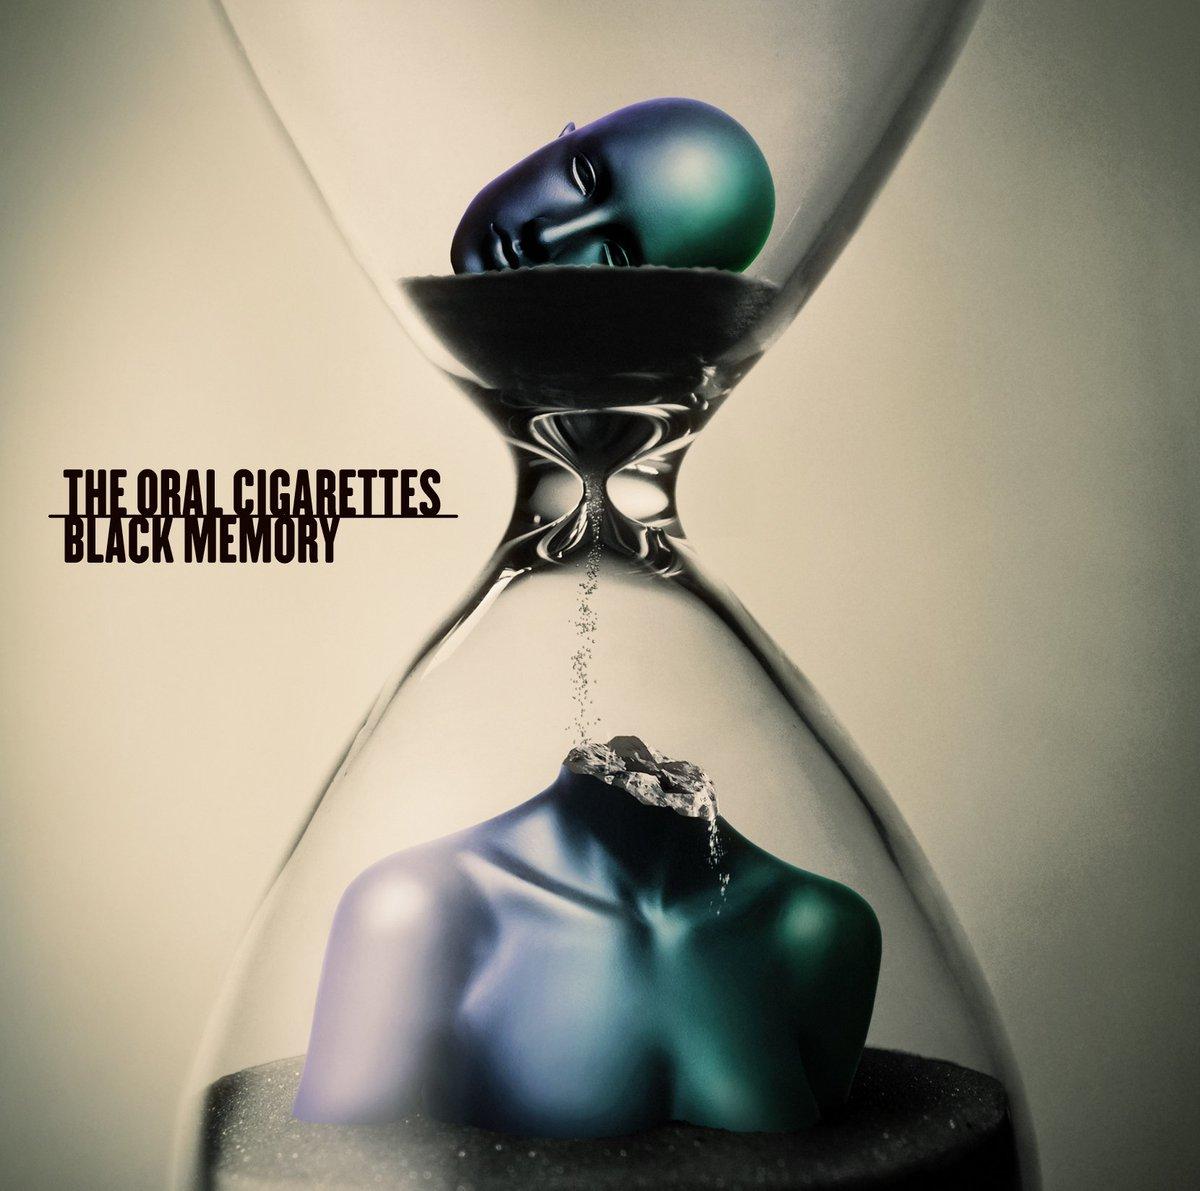 THE ORAL CIGARETTES 9/27発売 映画亜人主題歌のニューシングル 『BLACK MEMORY』!TS